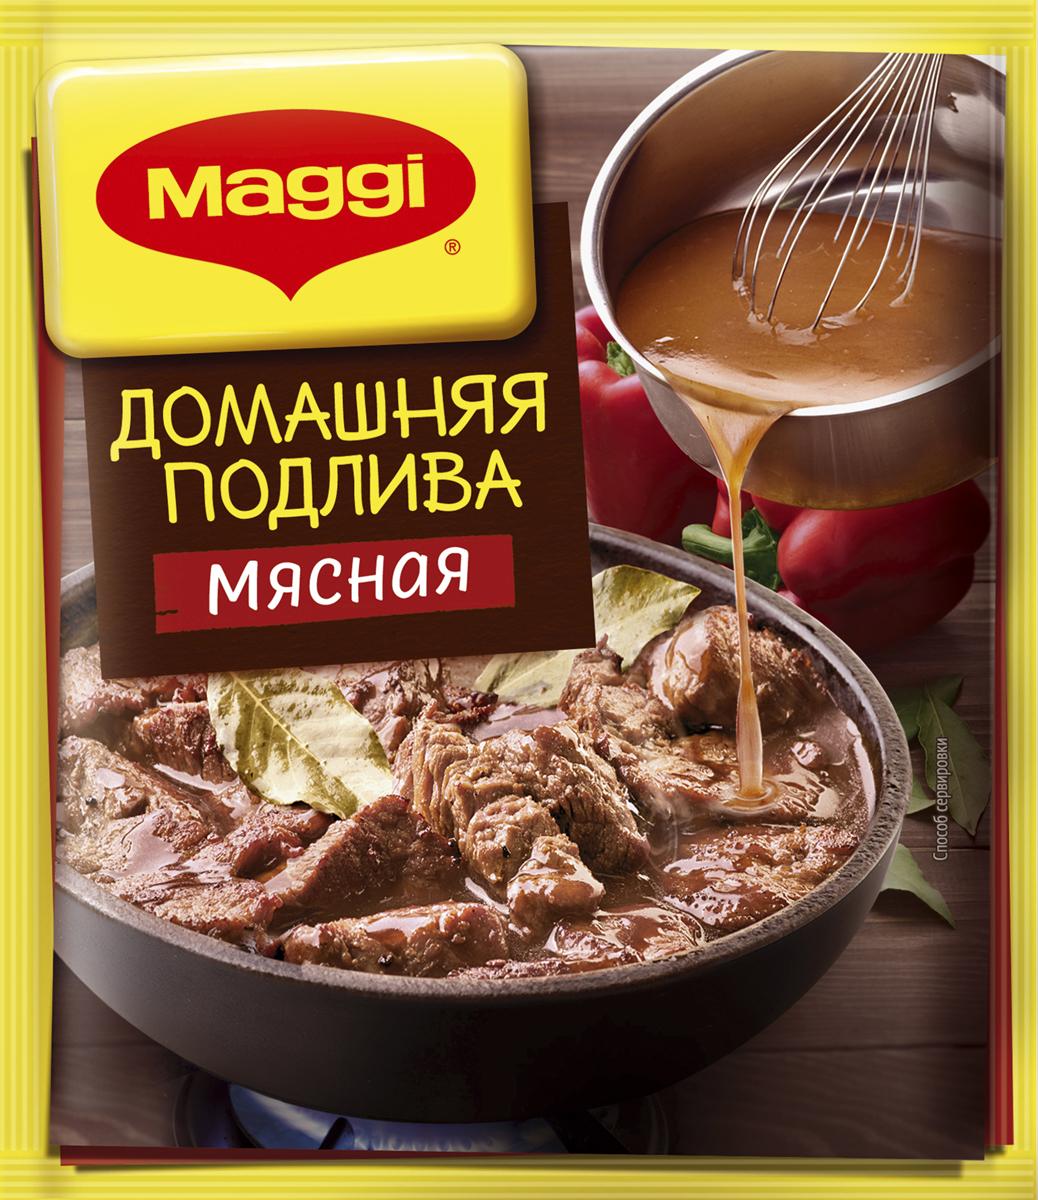 все цены на Maggi Подлива домашняя мясная, 90 г онлайн